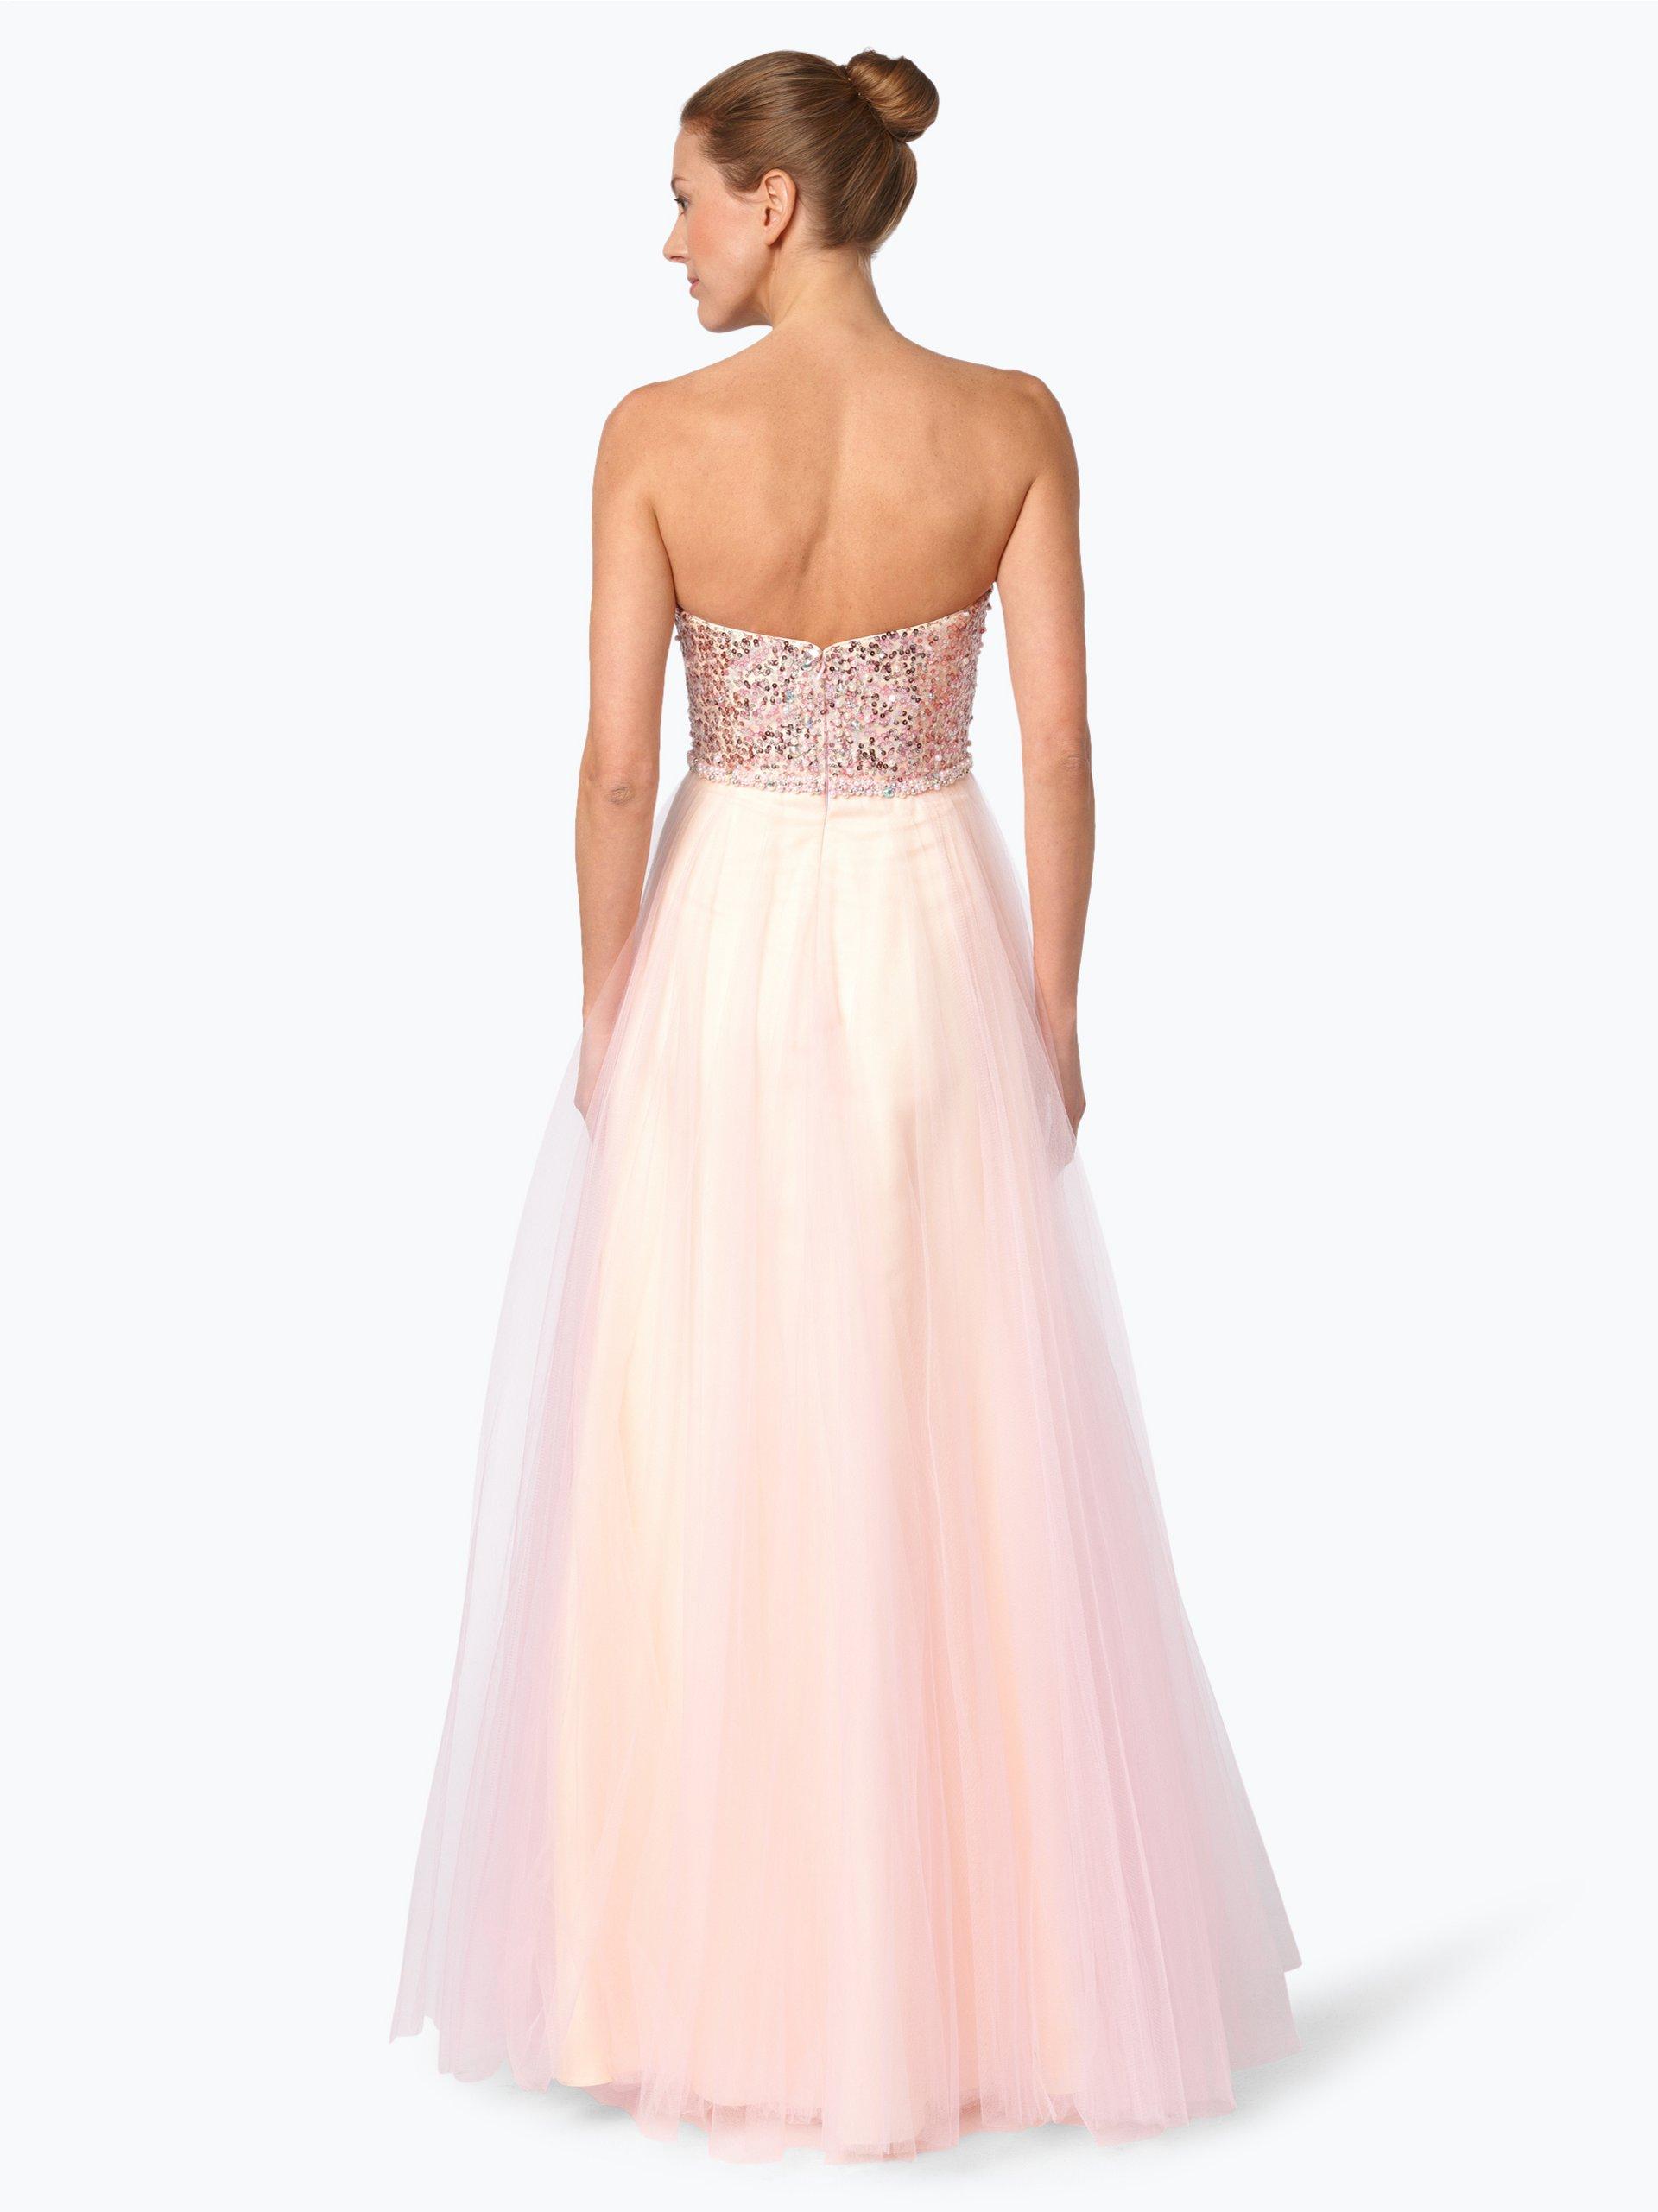 Abendkleid mit stola luxuar